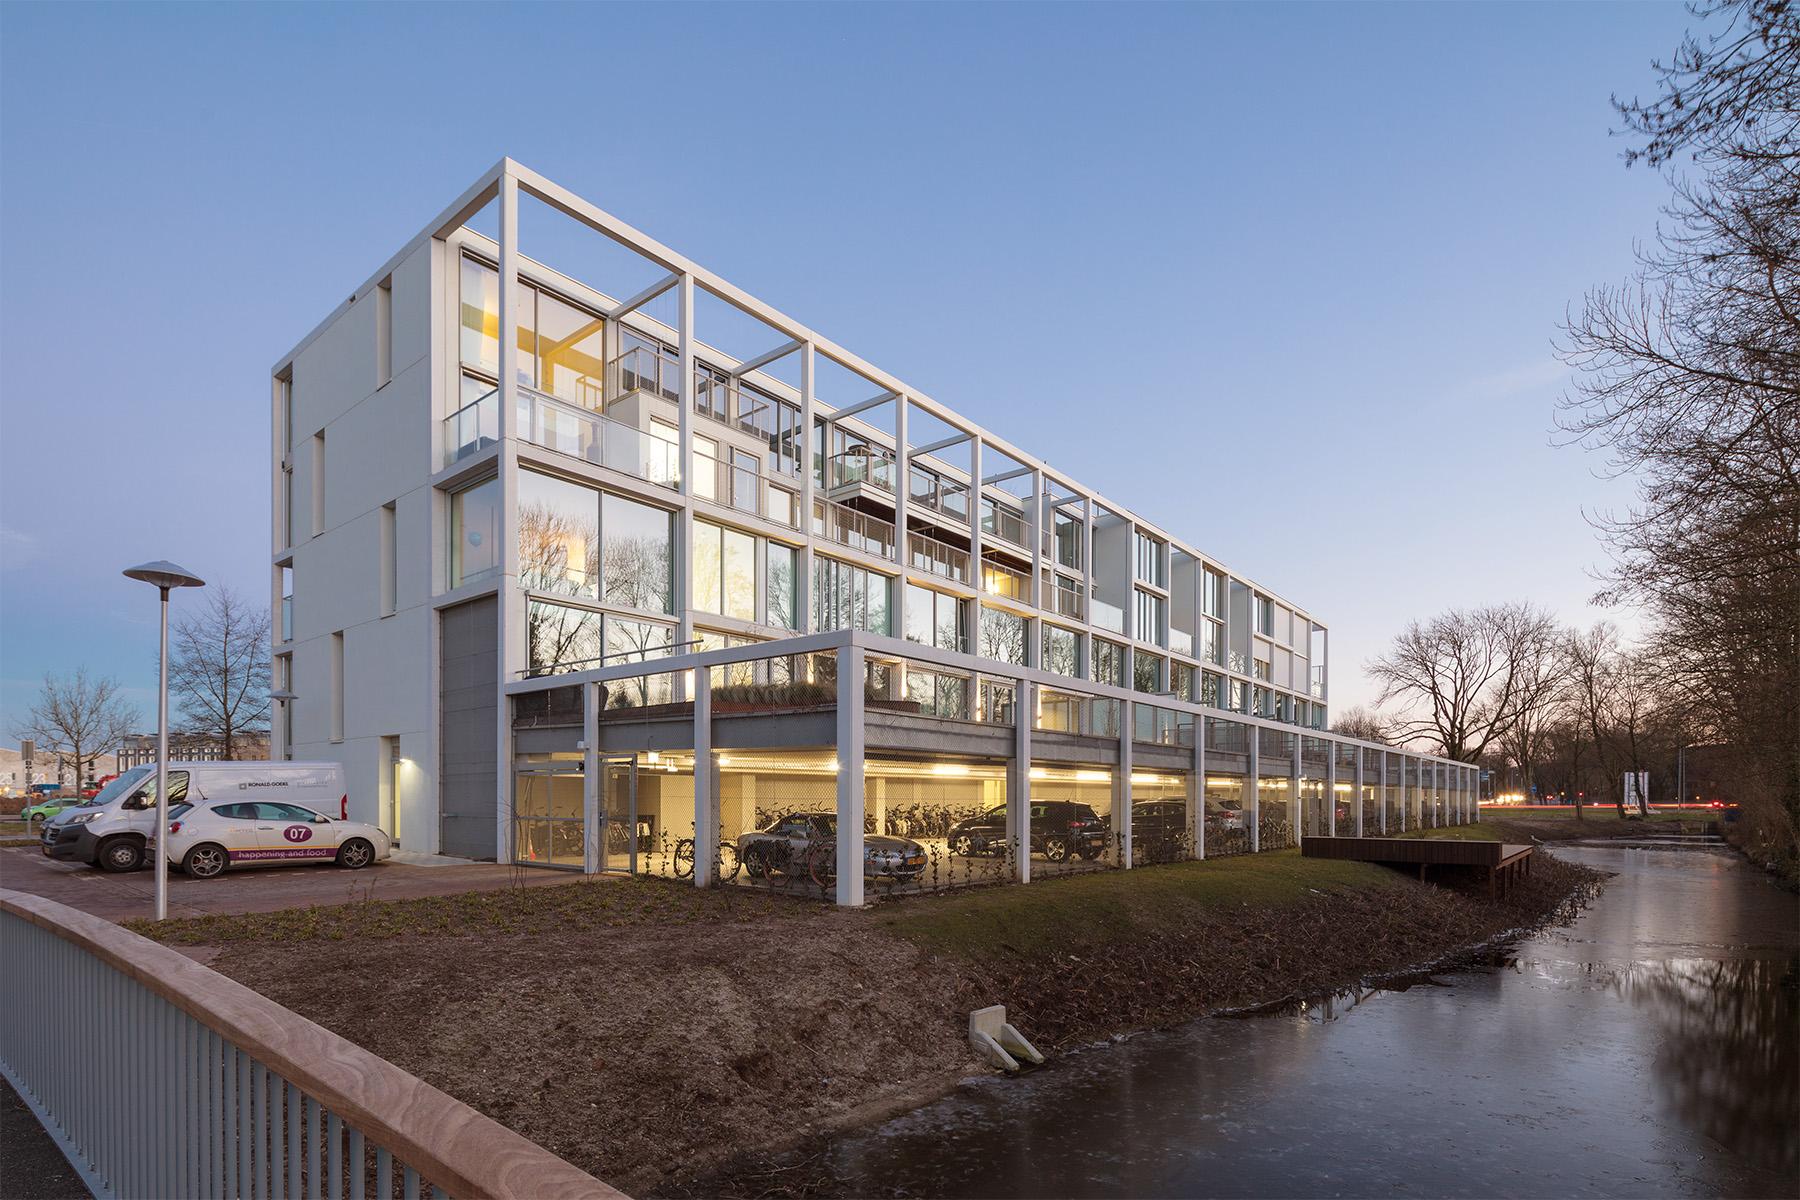 <p>Superlofts Blok Y, foto: Stijn Poelstra</p>